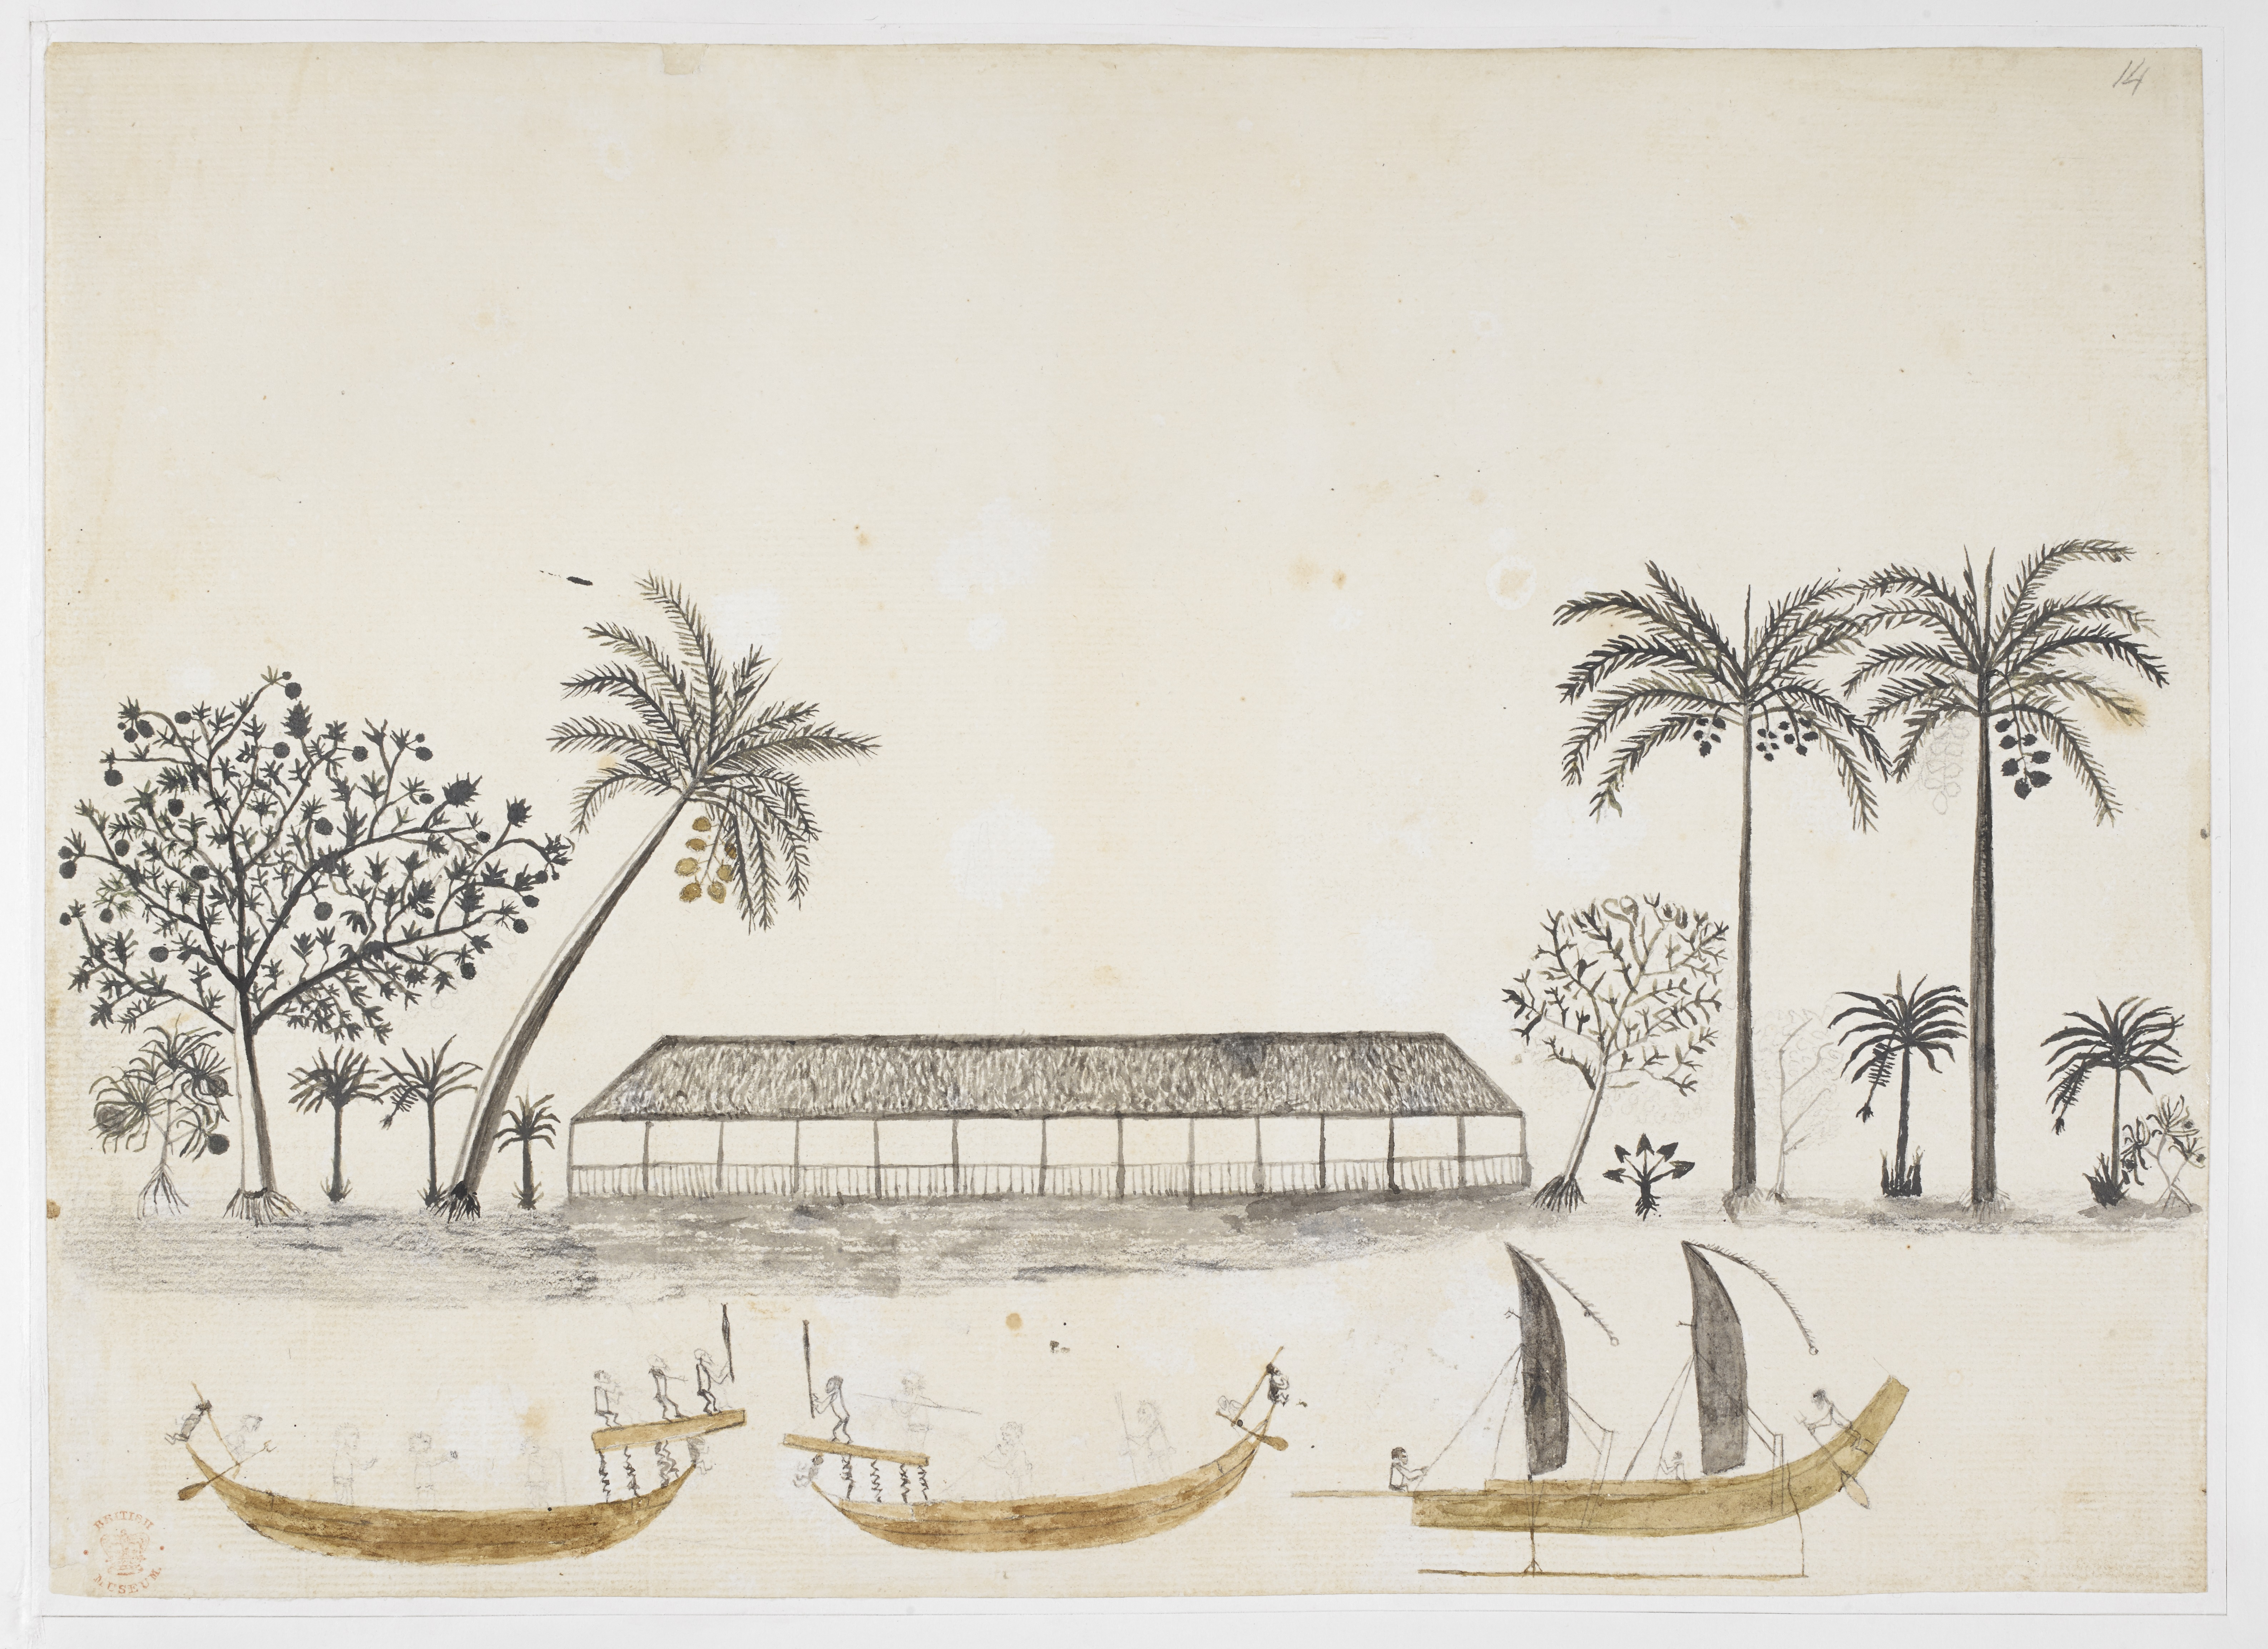 Tupaia Longhouse and Canoes in Tahiti